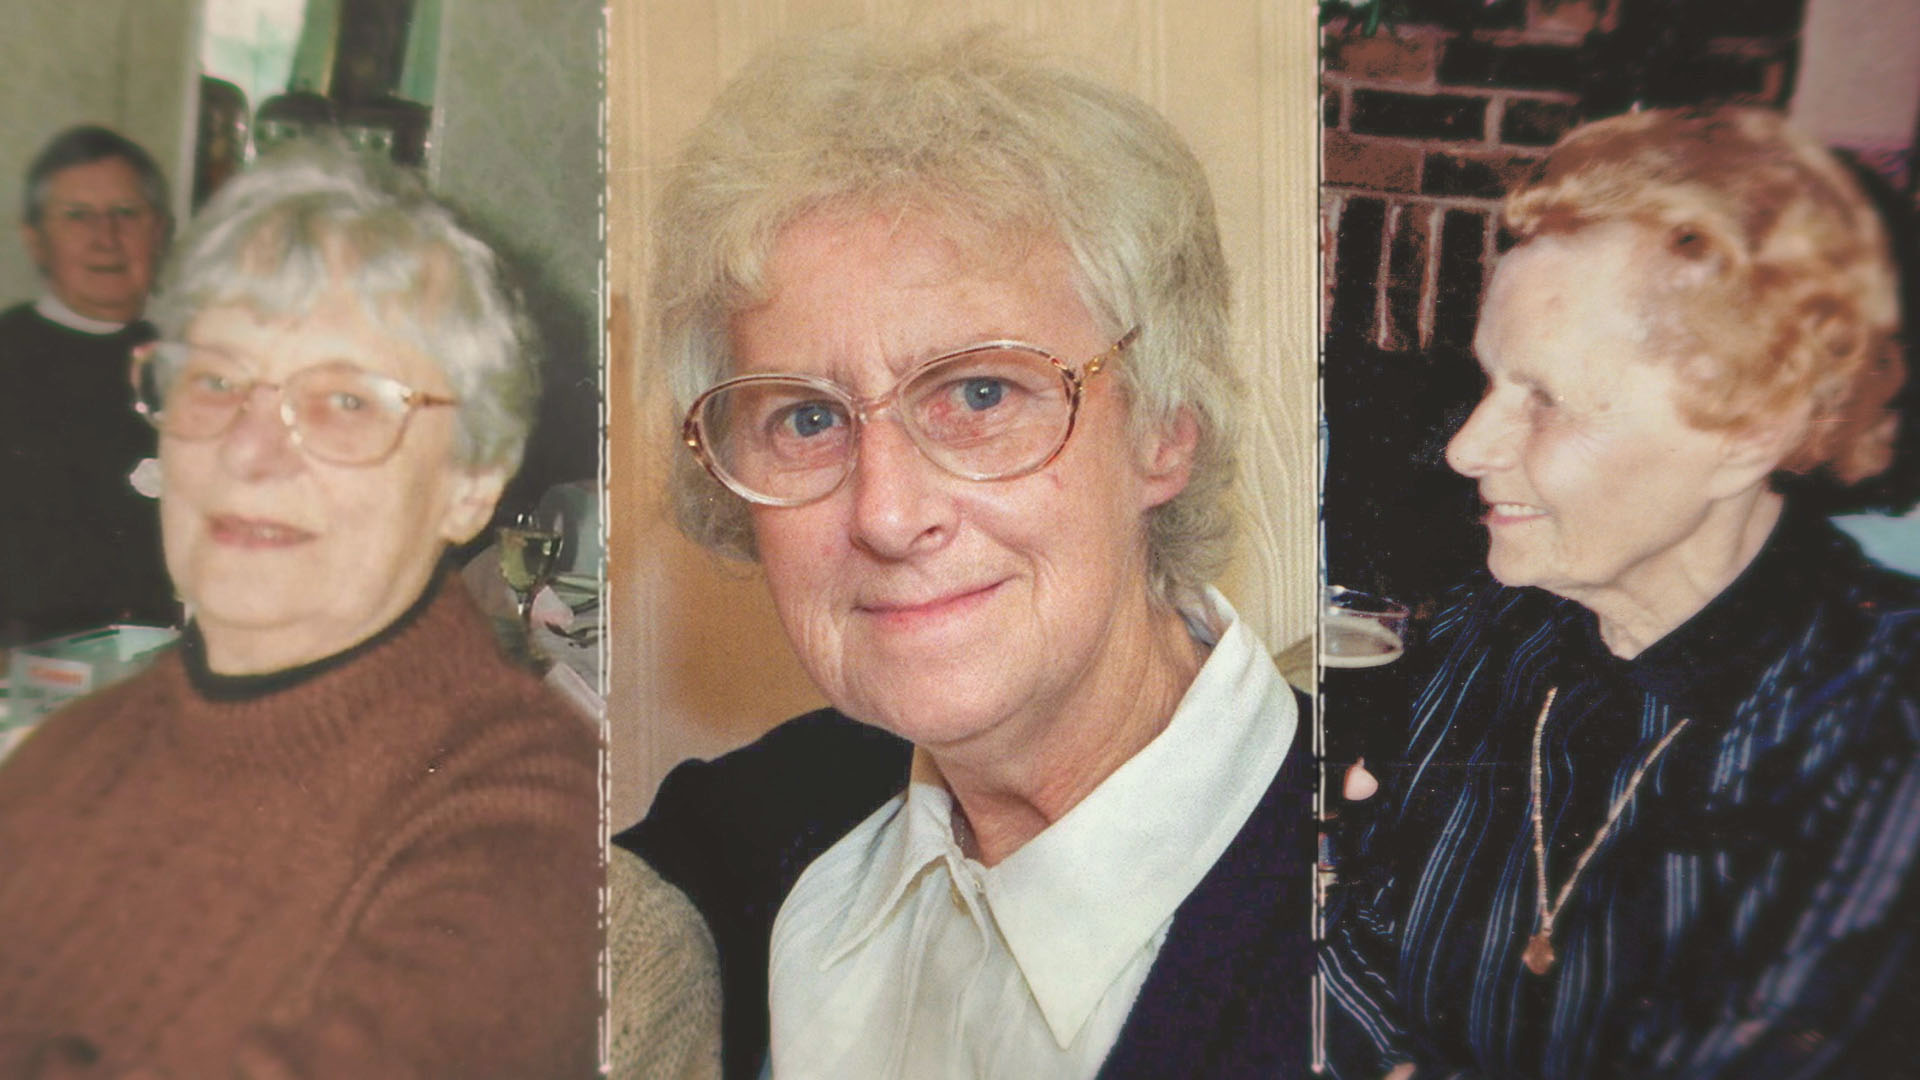 The Shipman Files, Harold Shipman victims